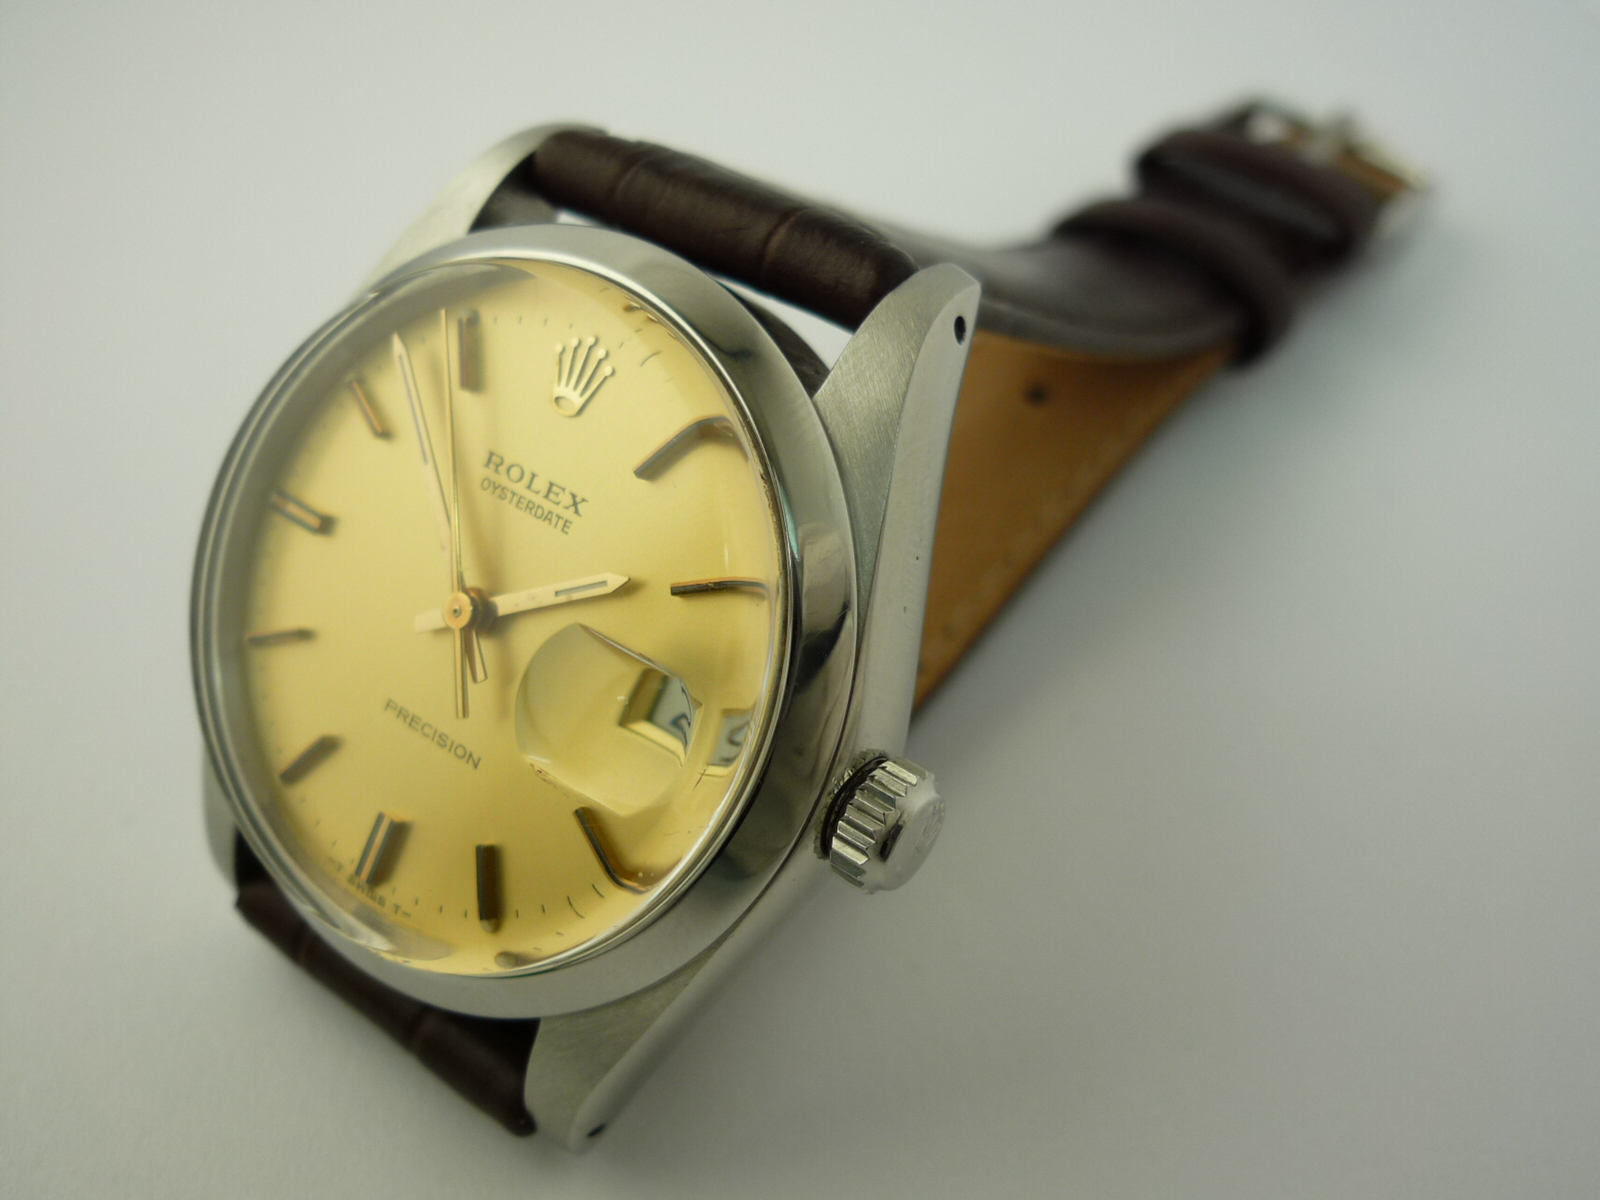 rolex oyster date precision watch ref 6694 1962. Black Bedroom Furniture Sets. Home Design Ideas